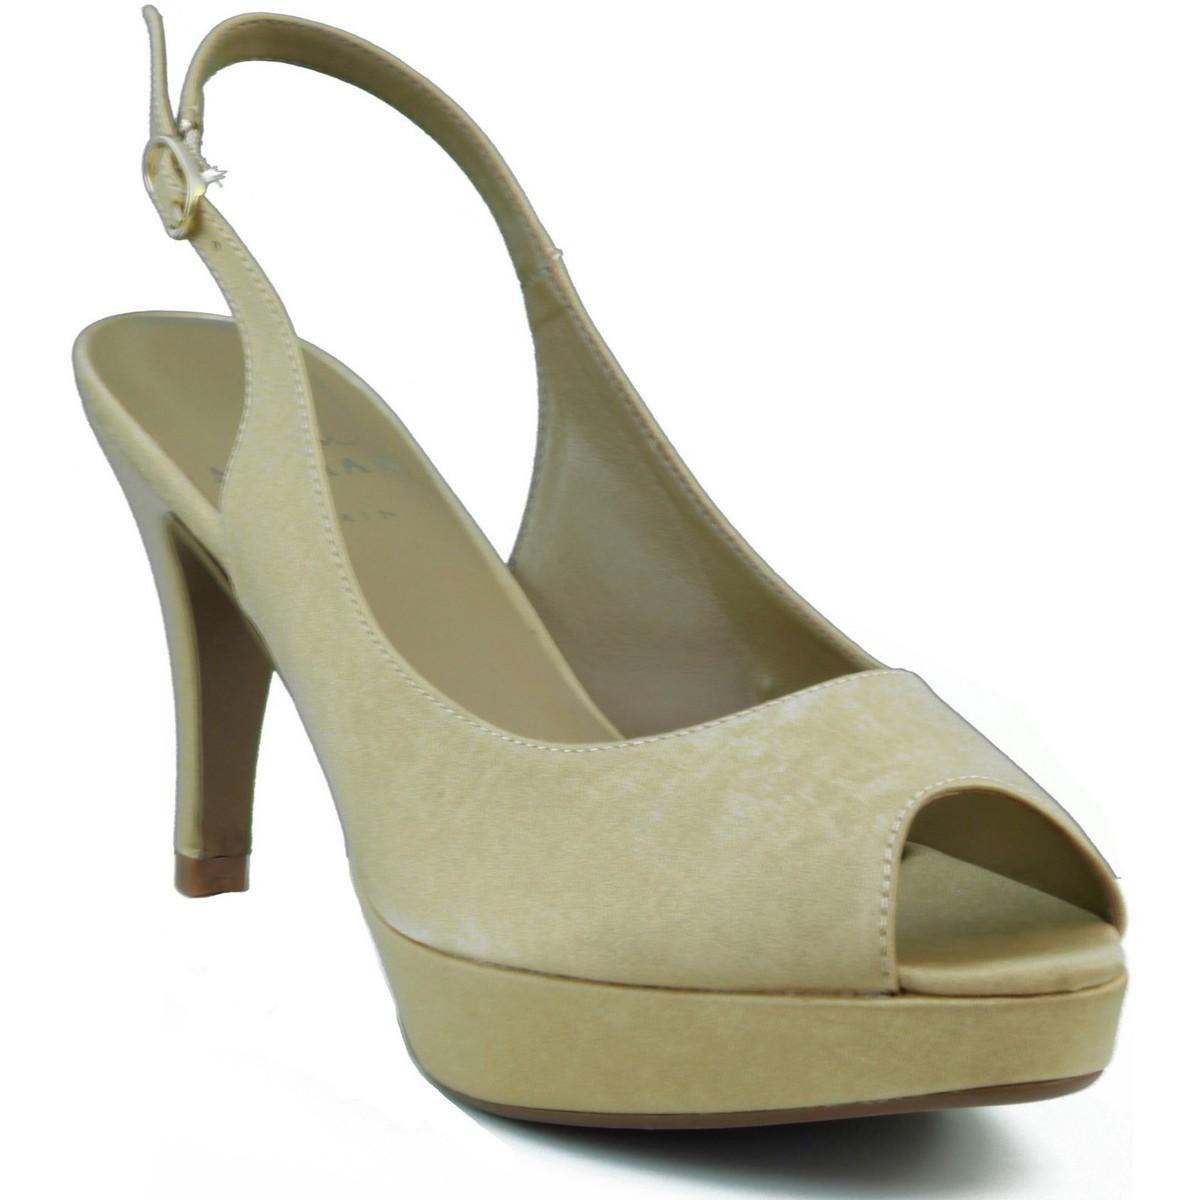 marian chaussures de soir e femme dor chaussures sandale femme 78 75. Black Bedroom Furniture Sets. Home Design Ideas